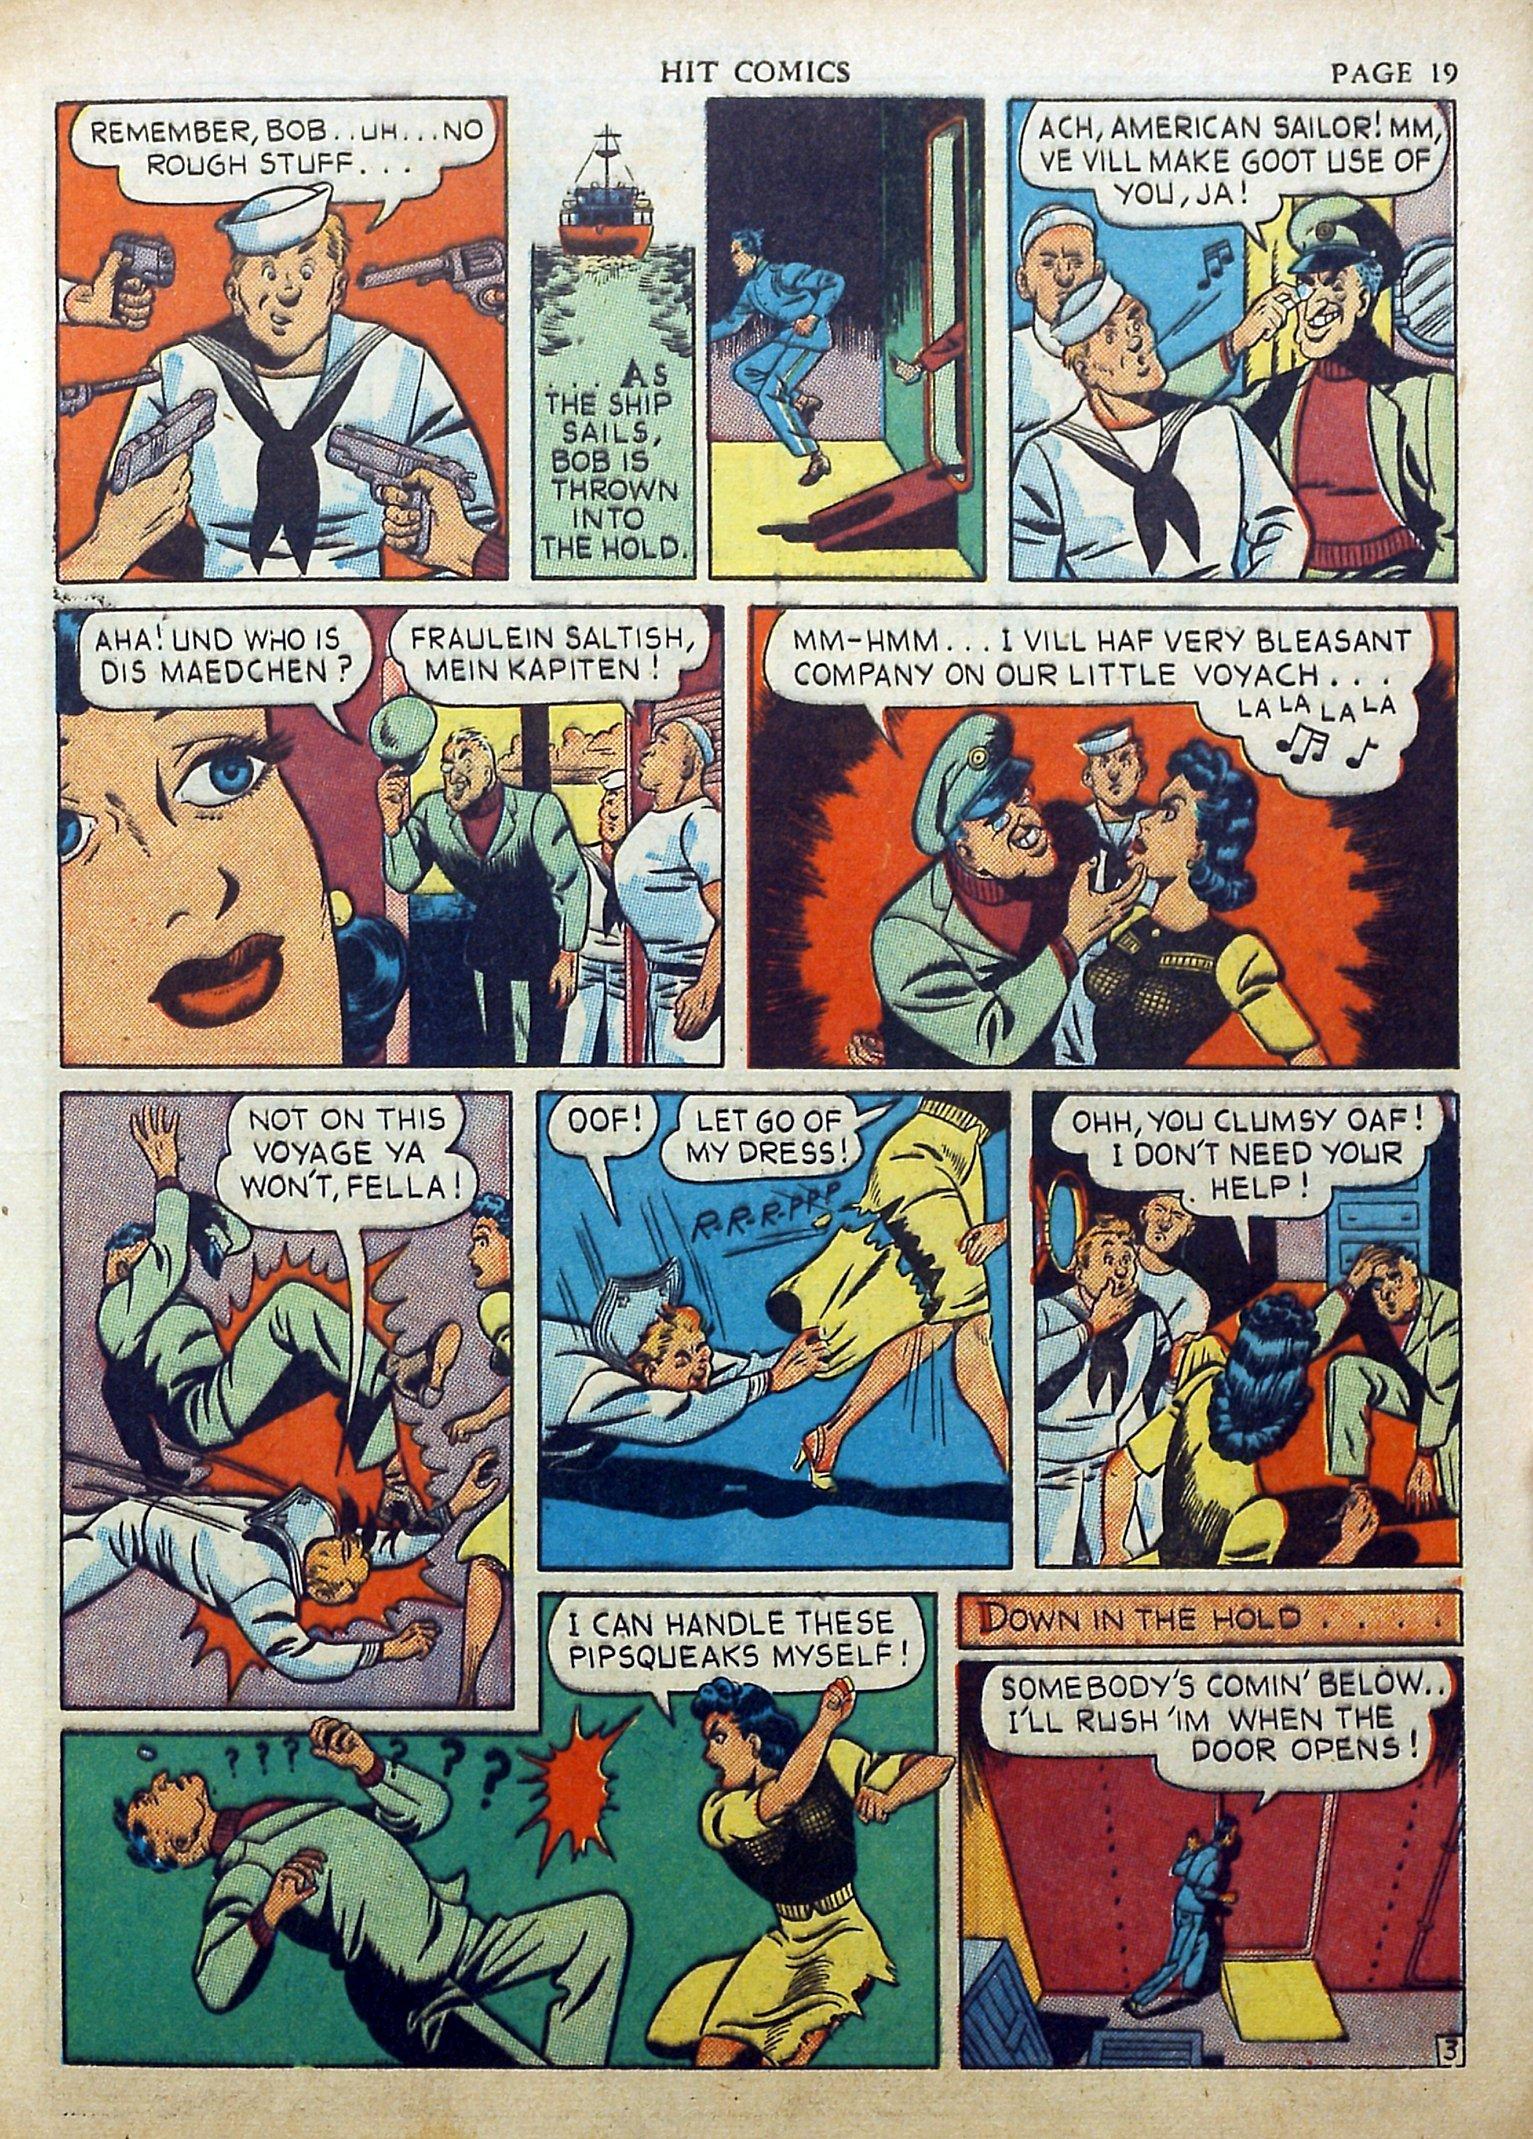 Read online Hit Comics comic -  Issue #17 - 21